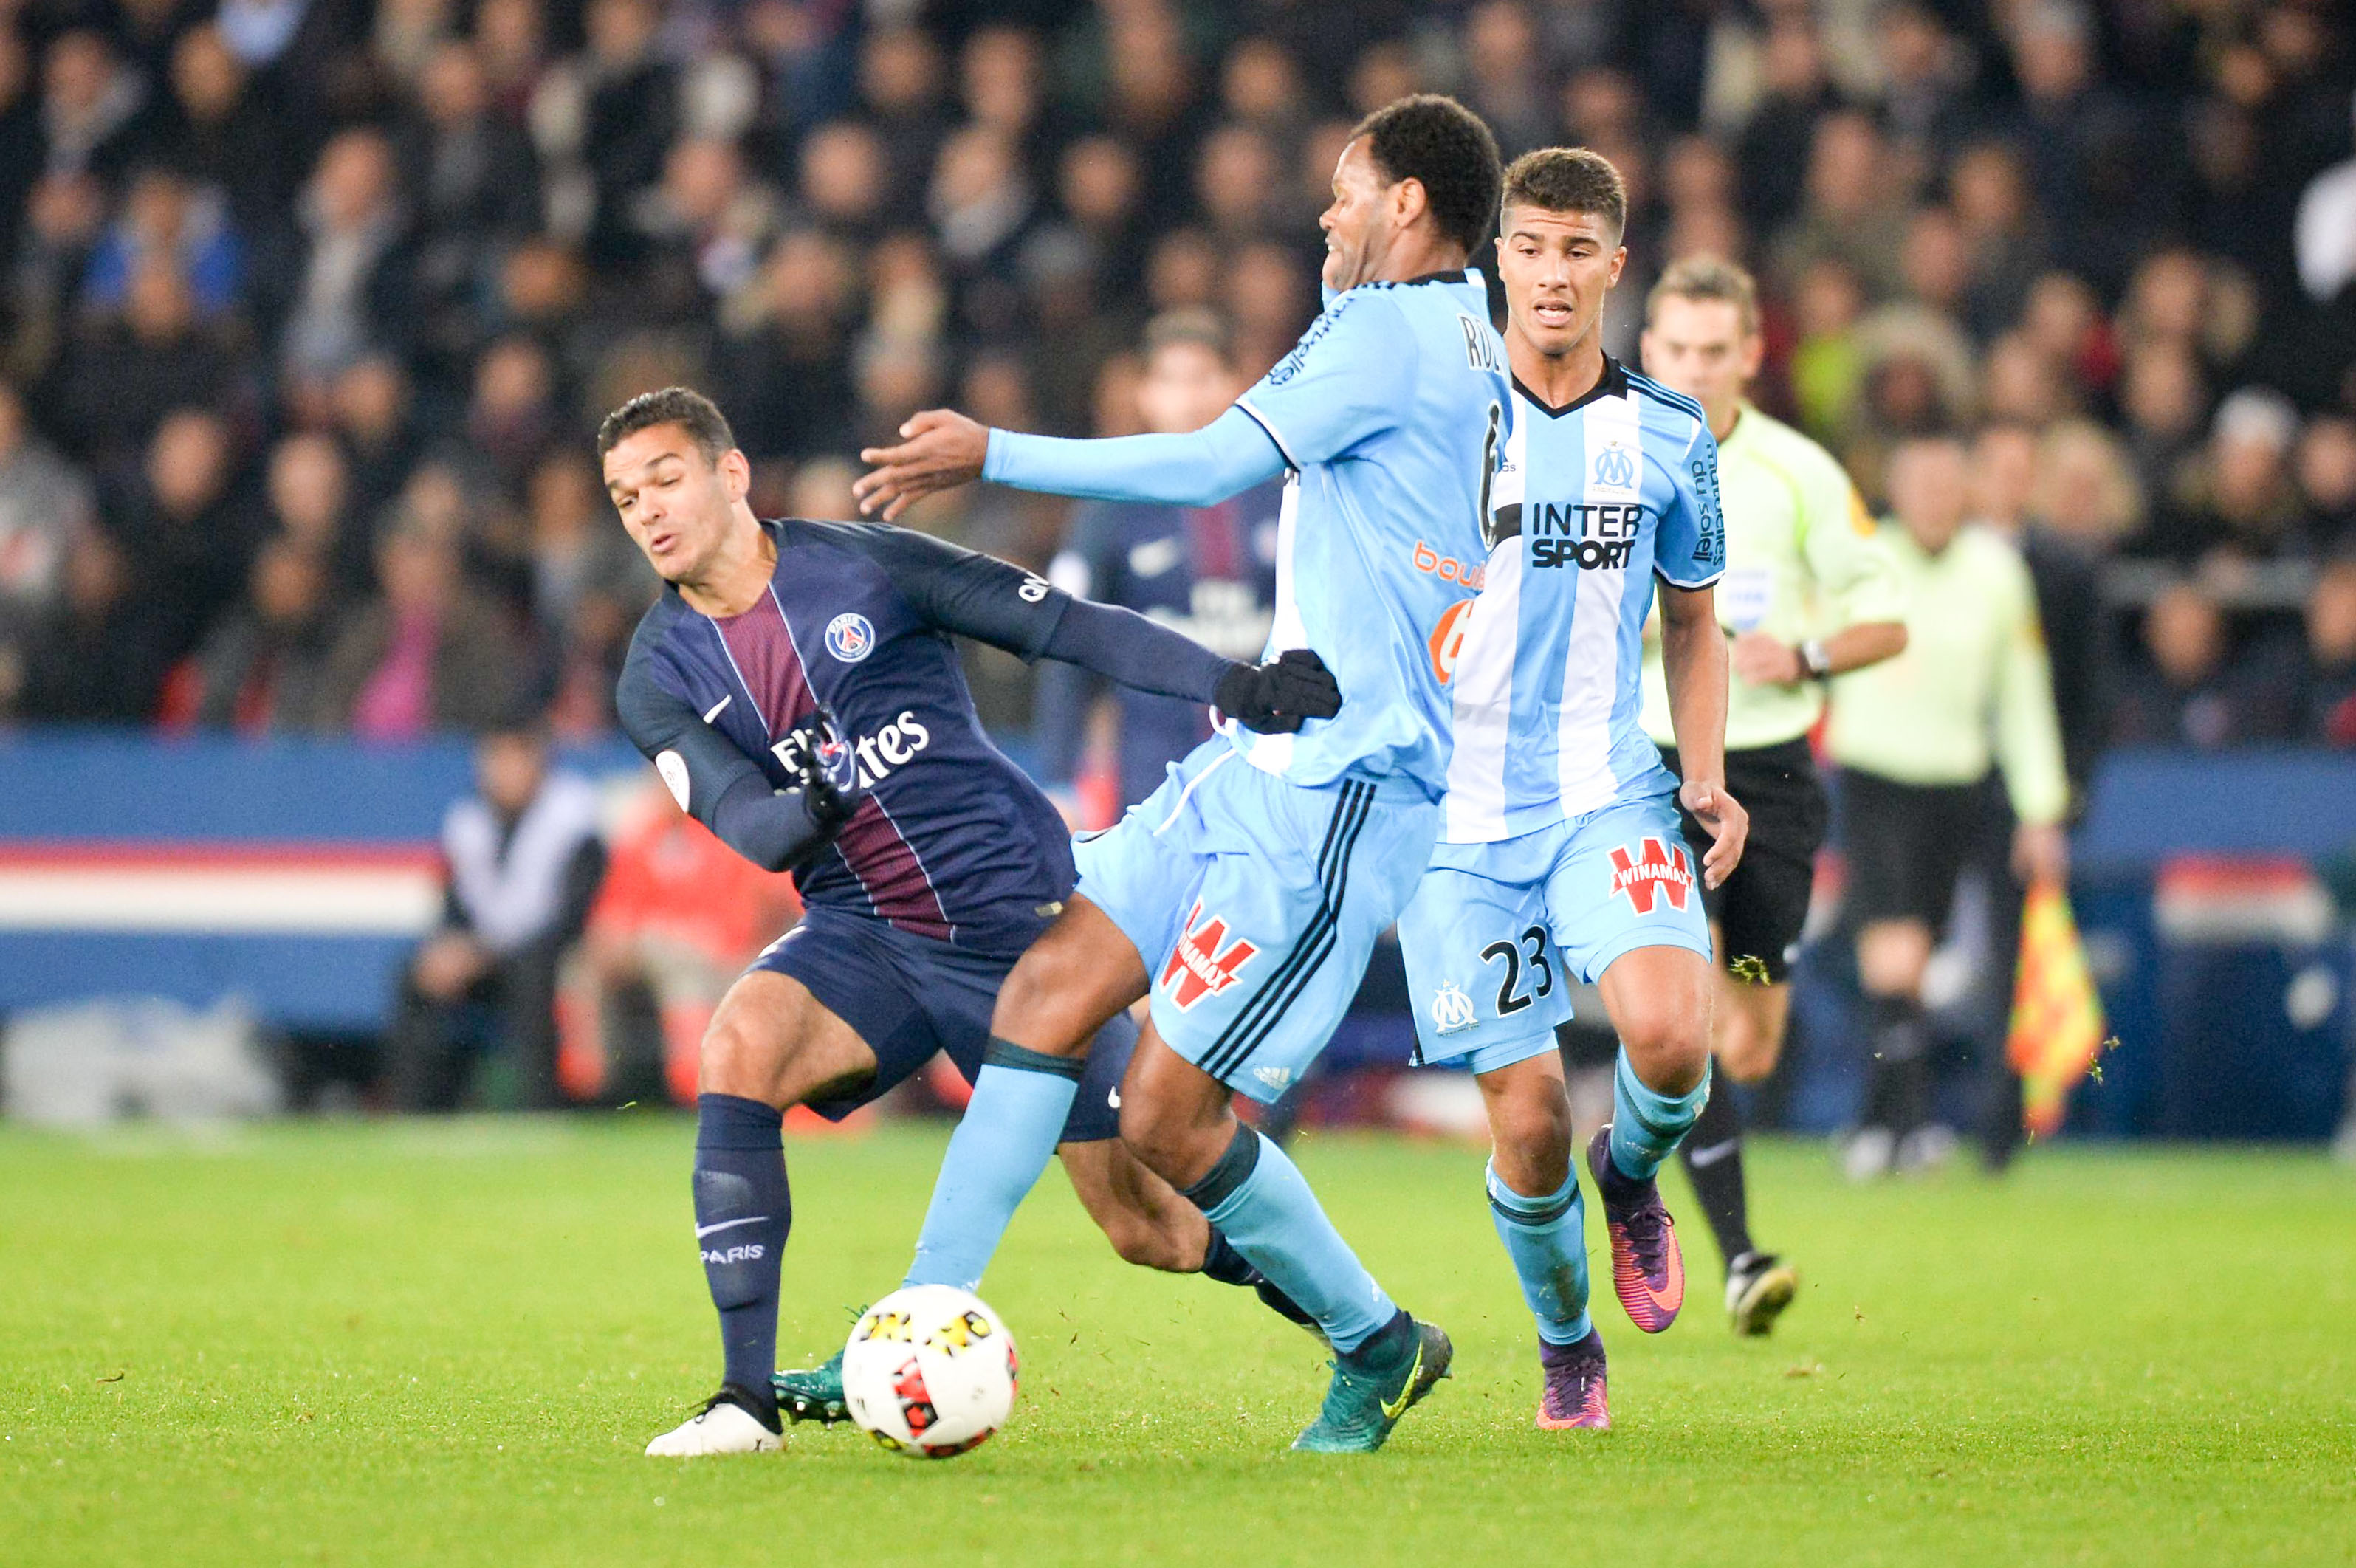 Football - Ligue 1 - Les notes de l'OM : Rolando en costaud, Njie fantomatique